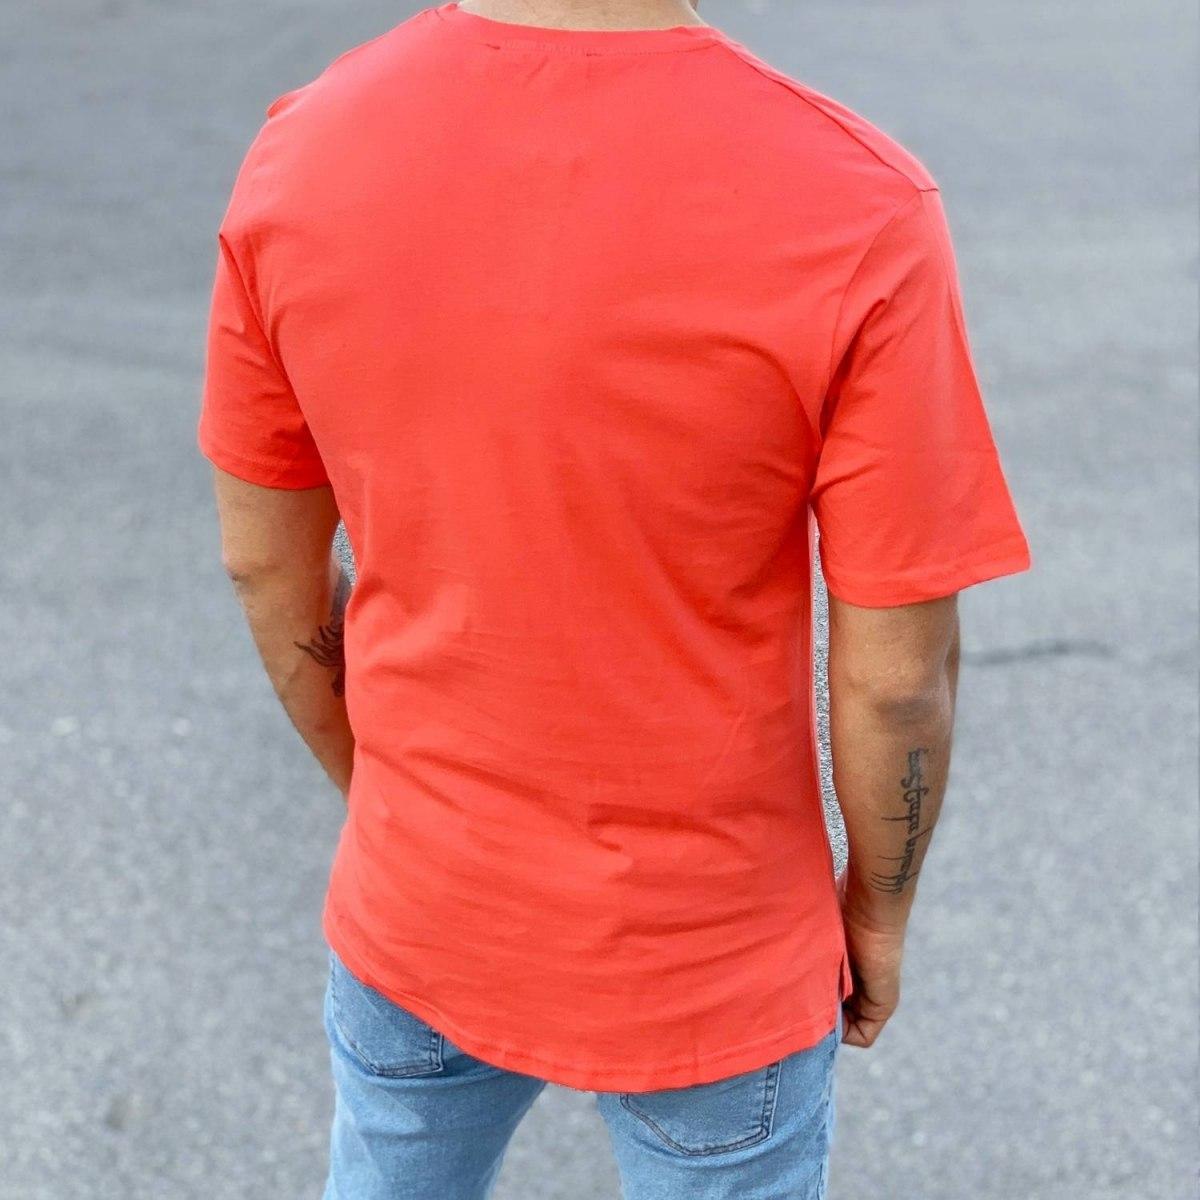 Men's Basic Round Neck T-Shirt In New Red Mv Premium Brand - 3